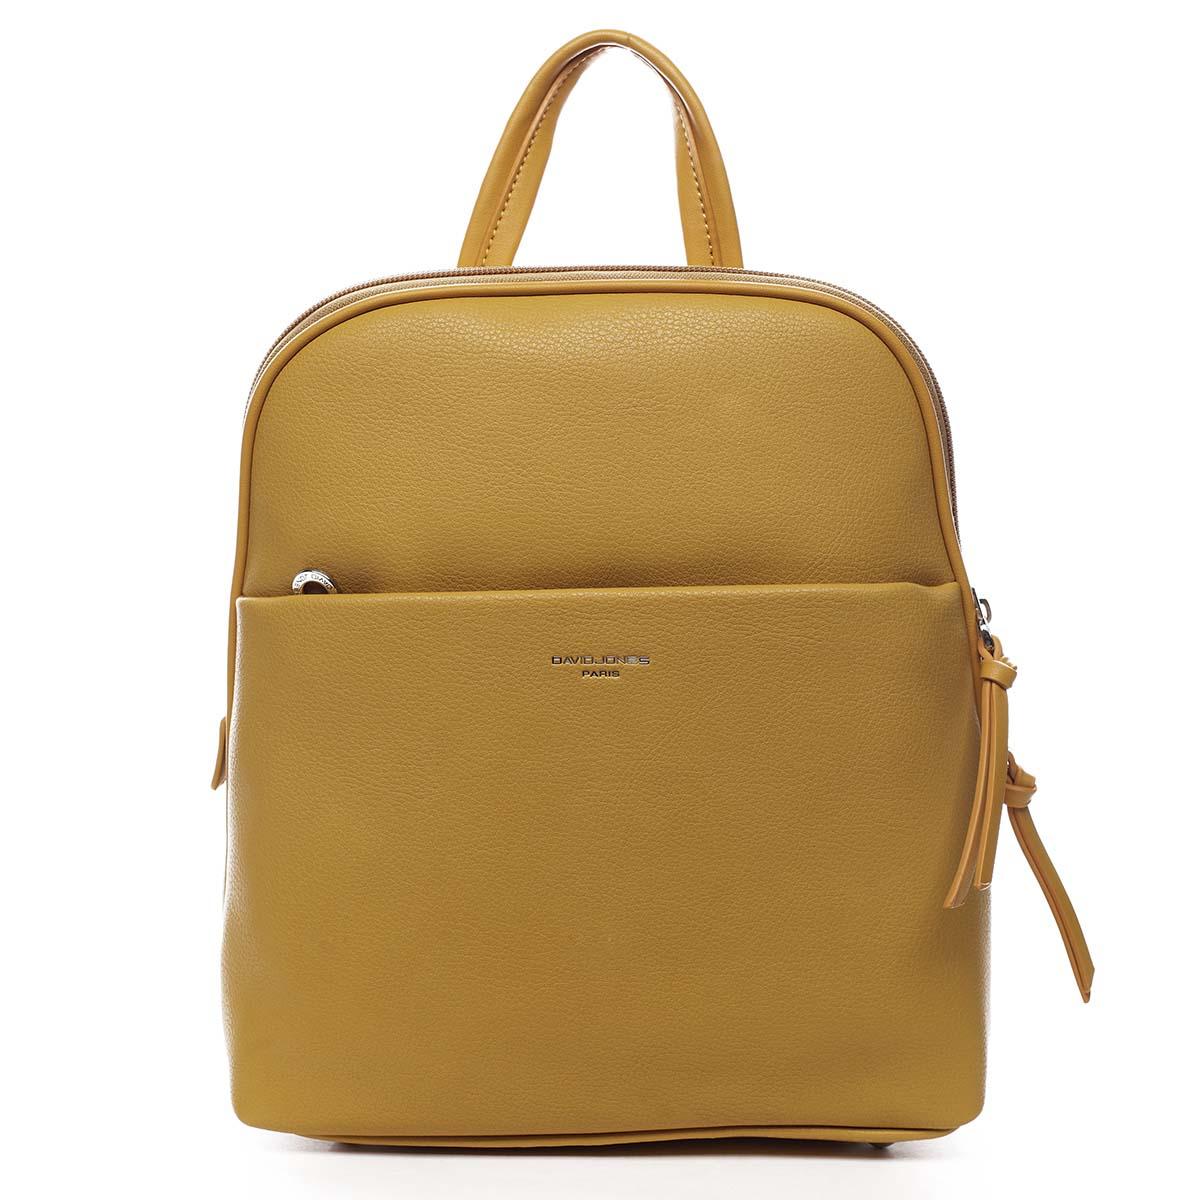 Dámsky mestský batoh žltý - David Jones Eliah